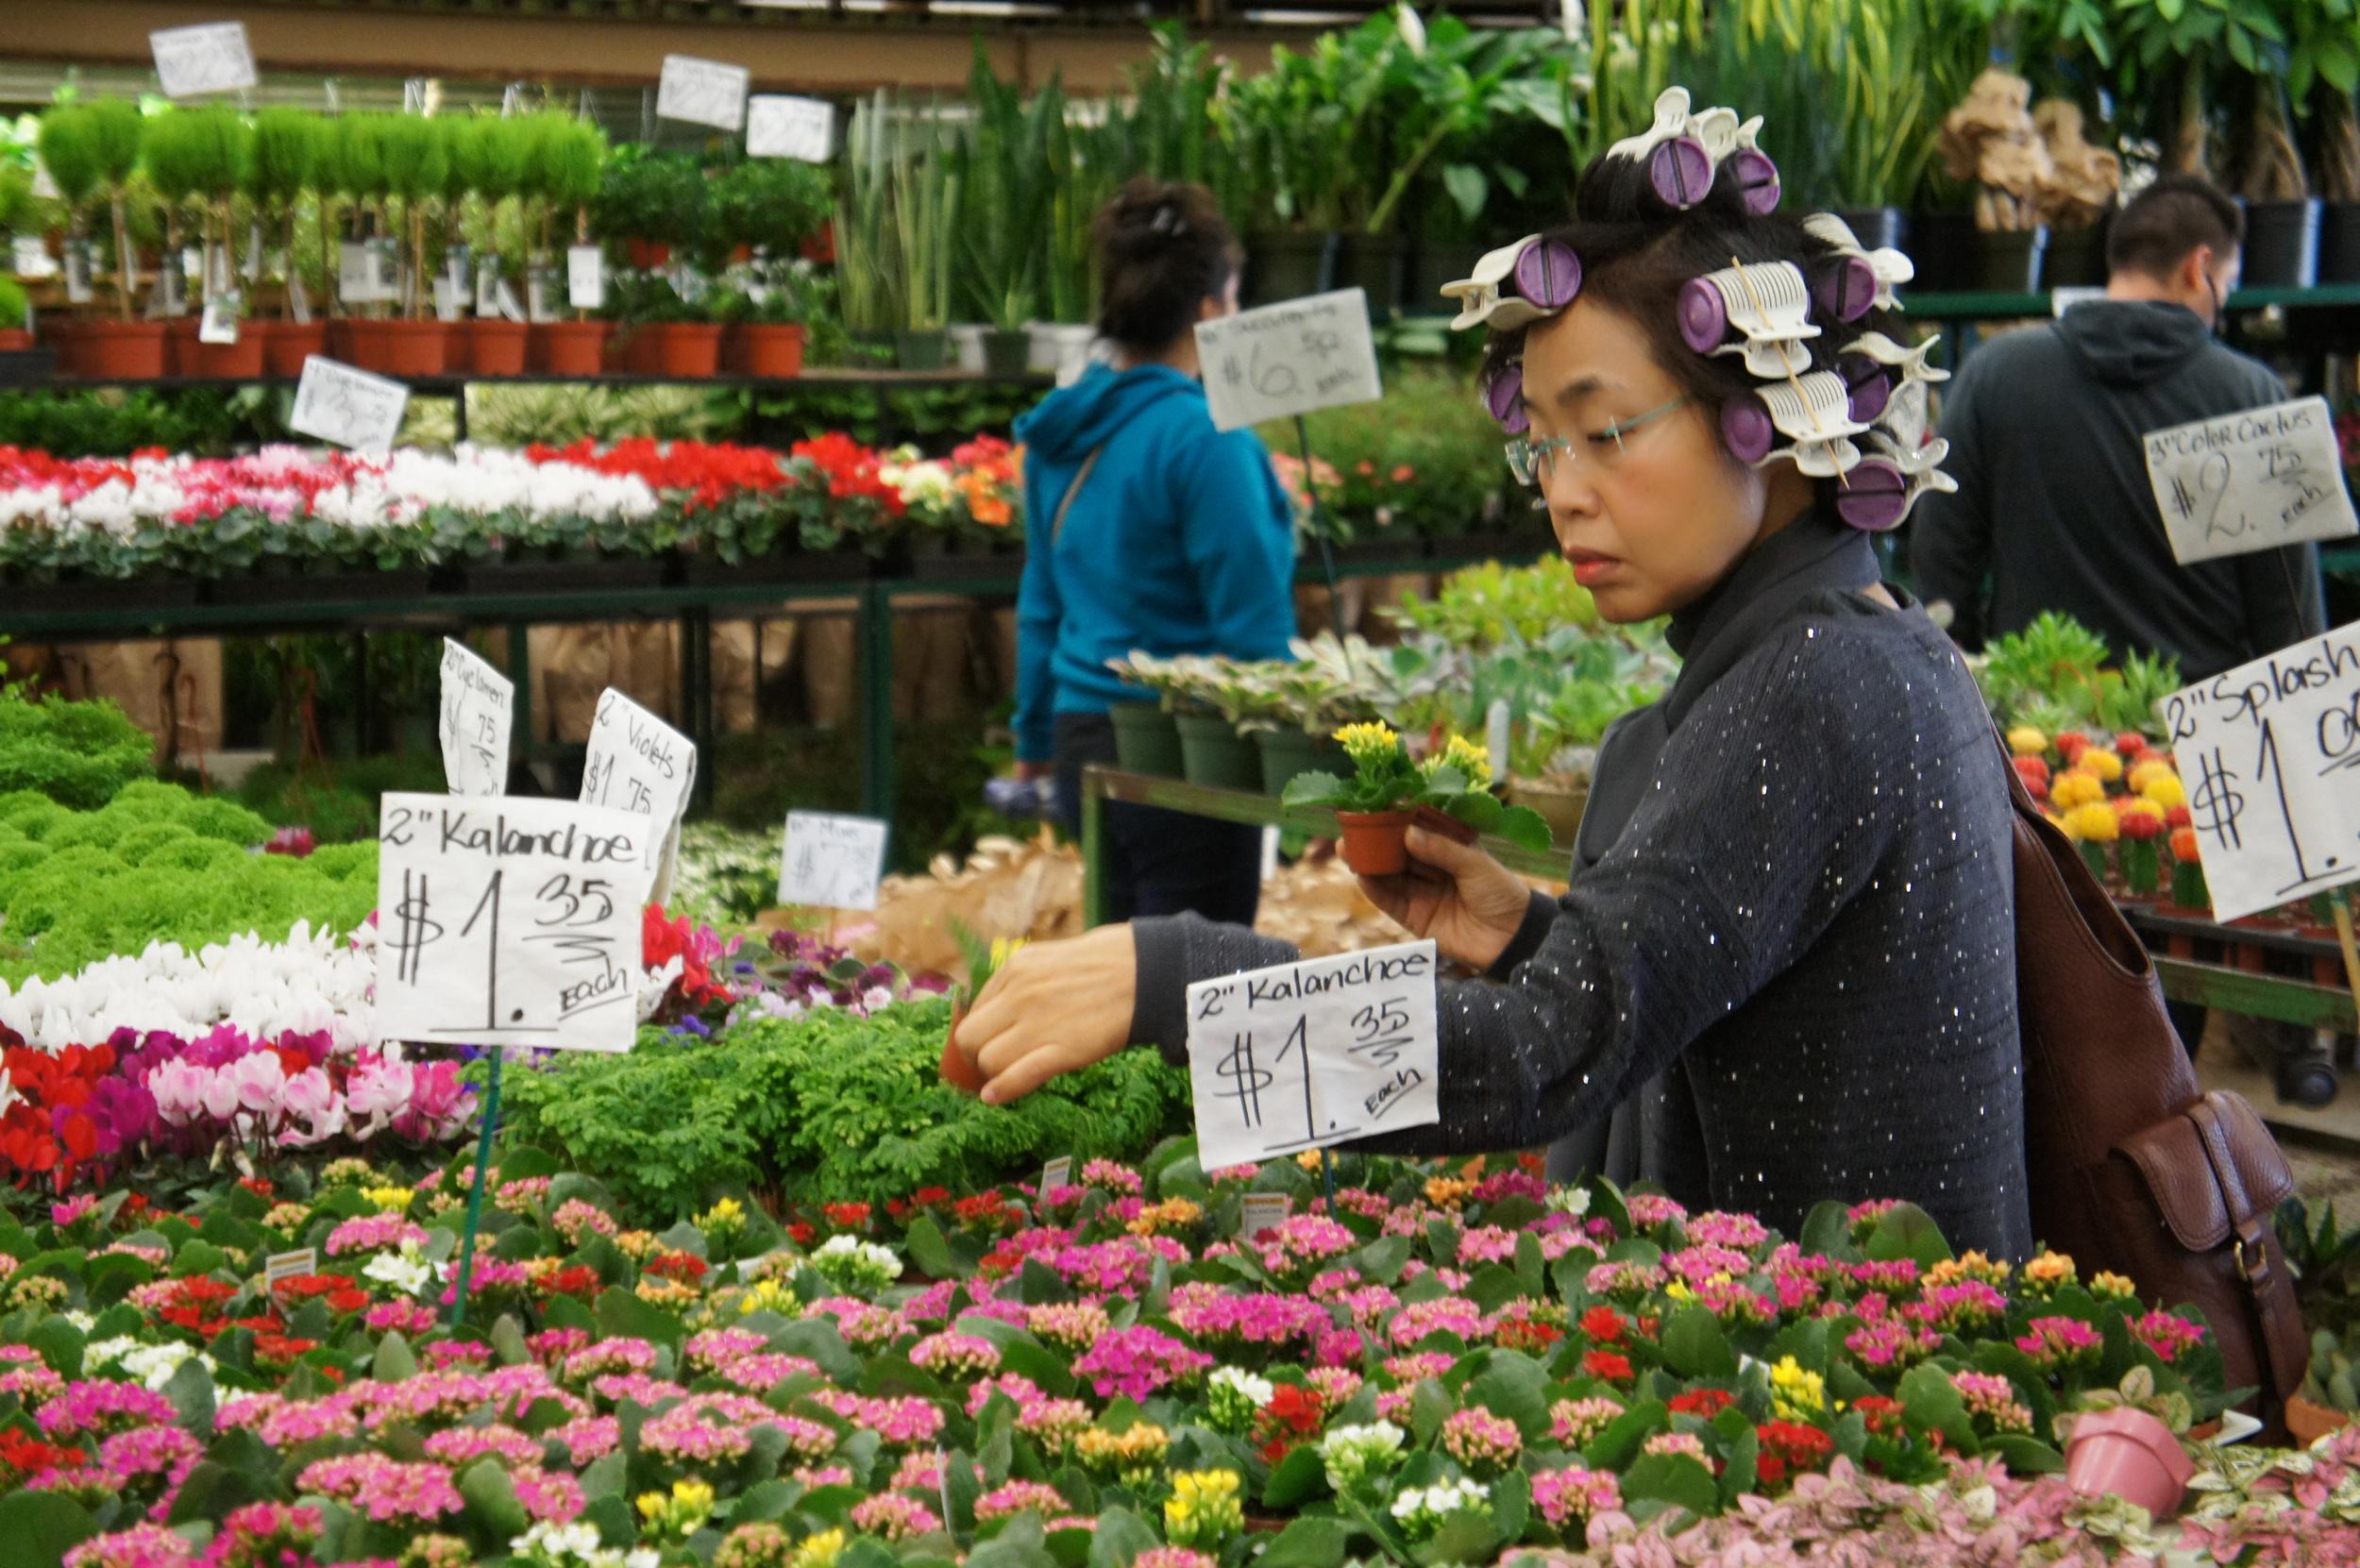 Lady wearing rollers in her hair looking at plants in Los Angeles flower market